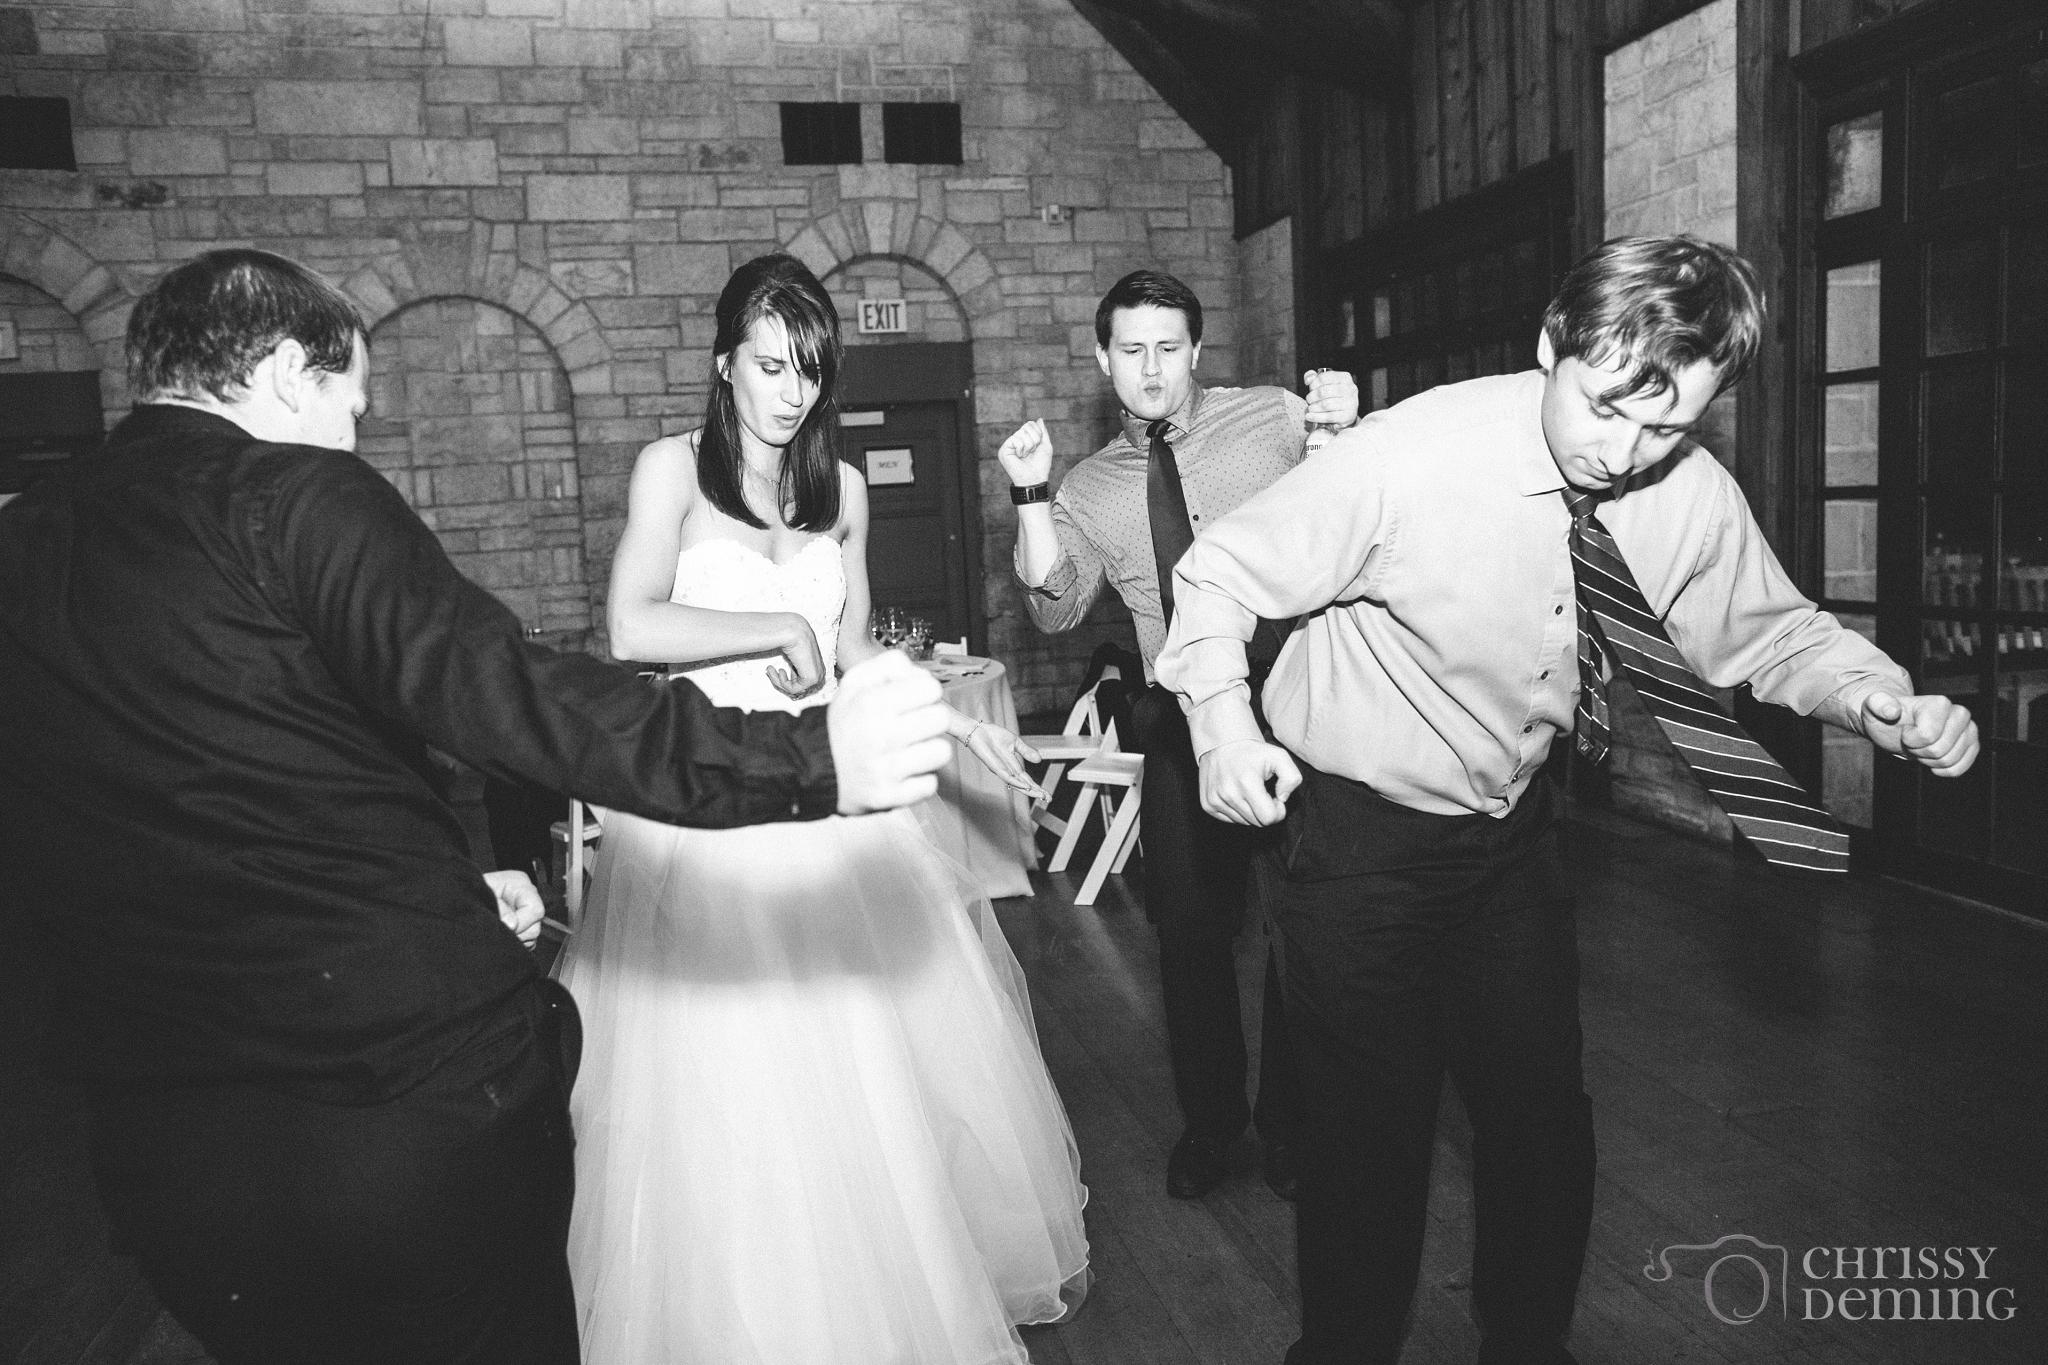 promontory_point_chicago_wedding_photography_0039.jpg